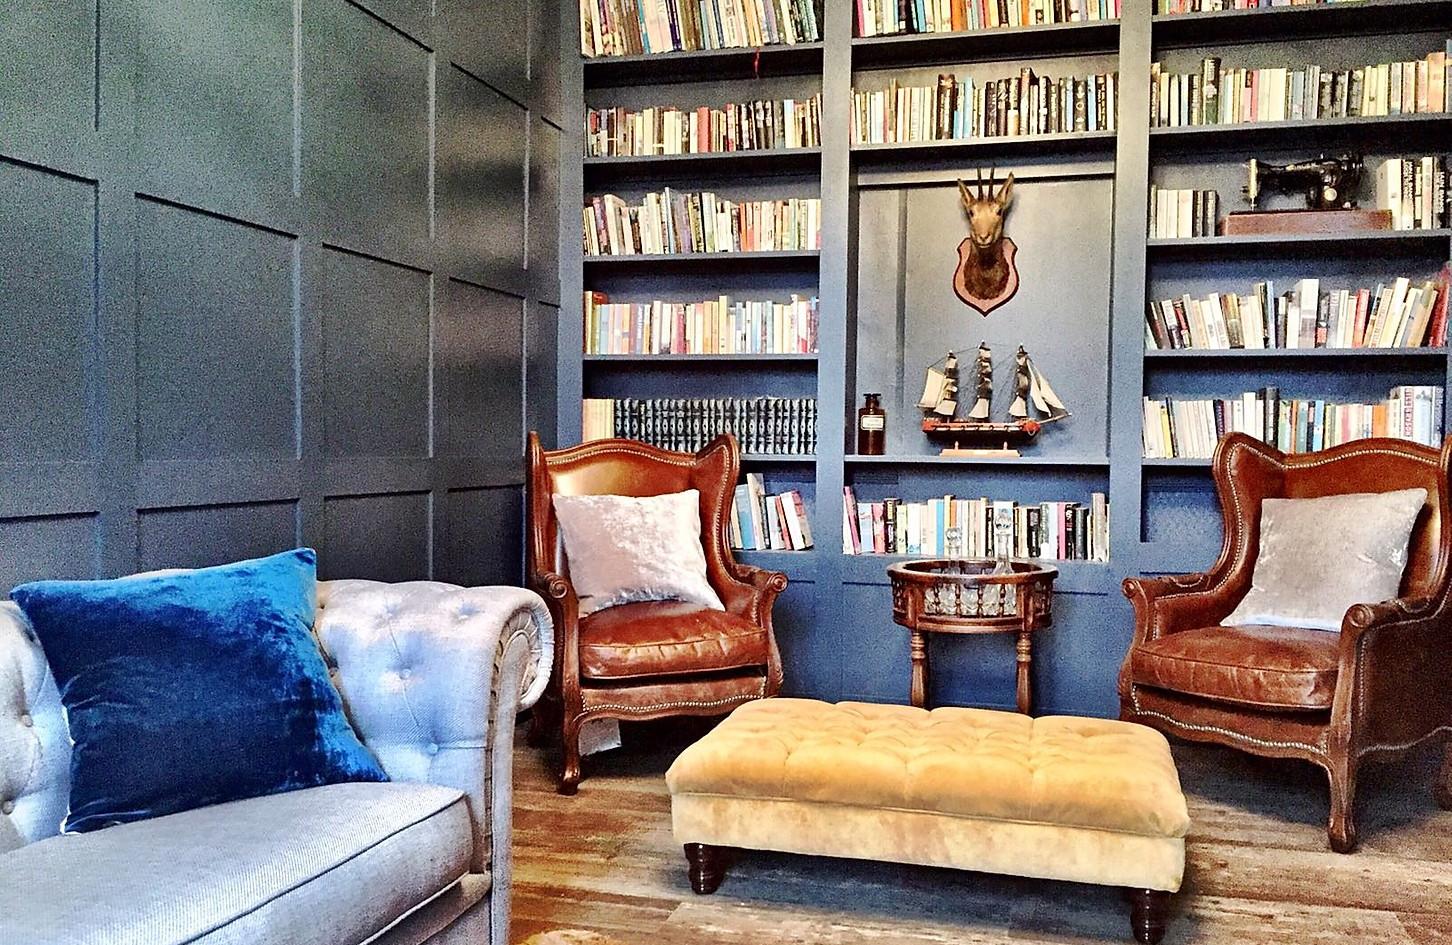 Maison_Library.jpg